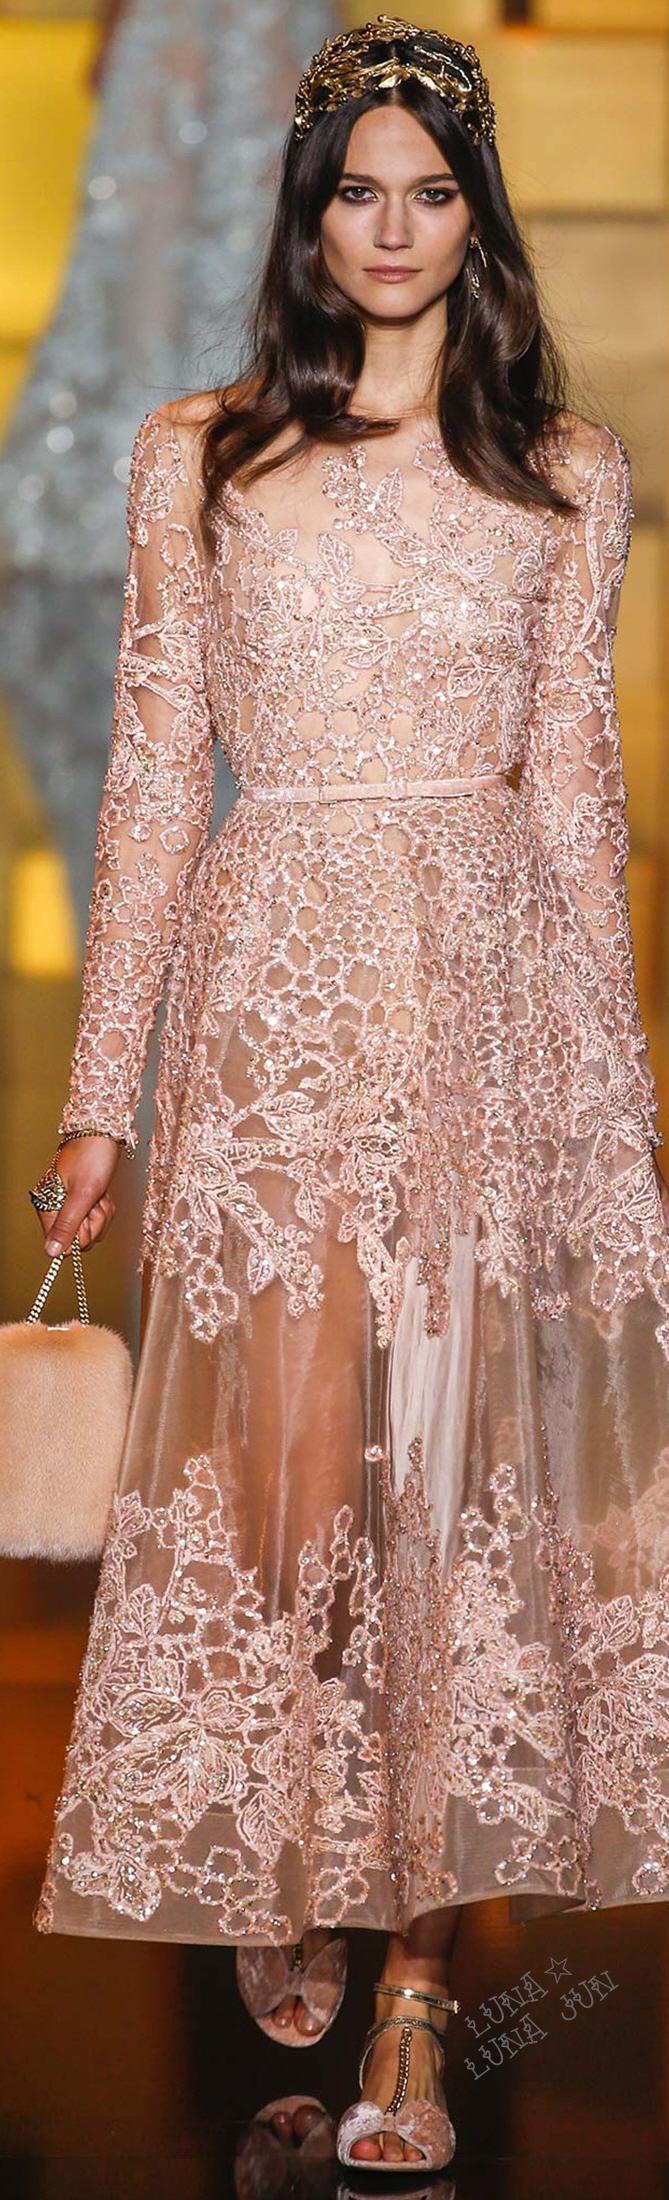 Elie Saab Fall 2015 Couture | Fashion | Pinterest | Madrinas de boda ...